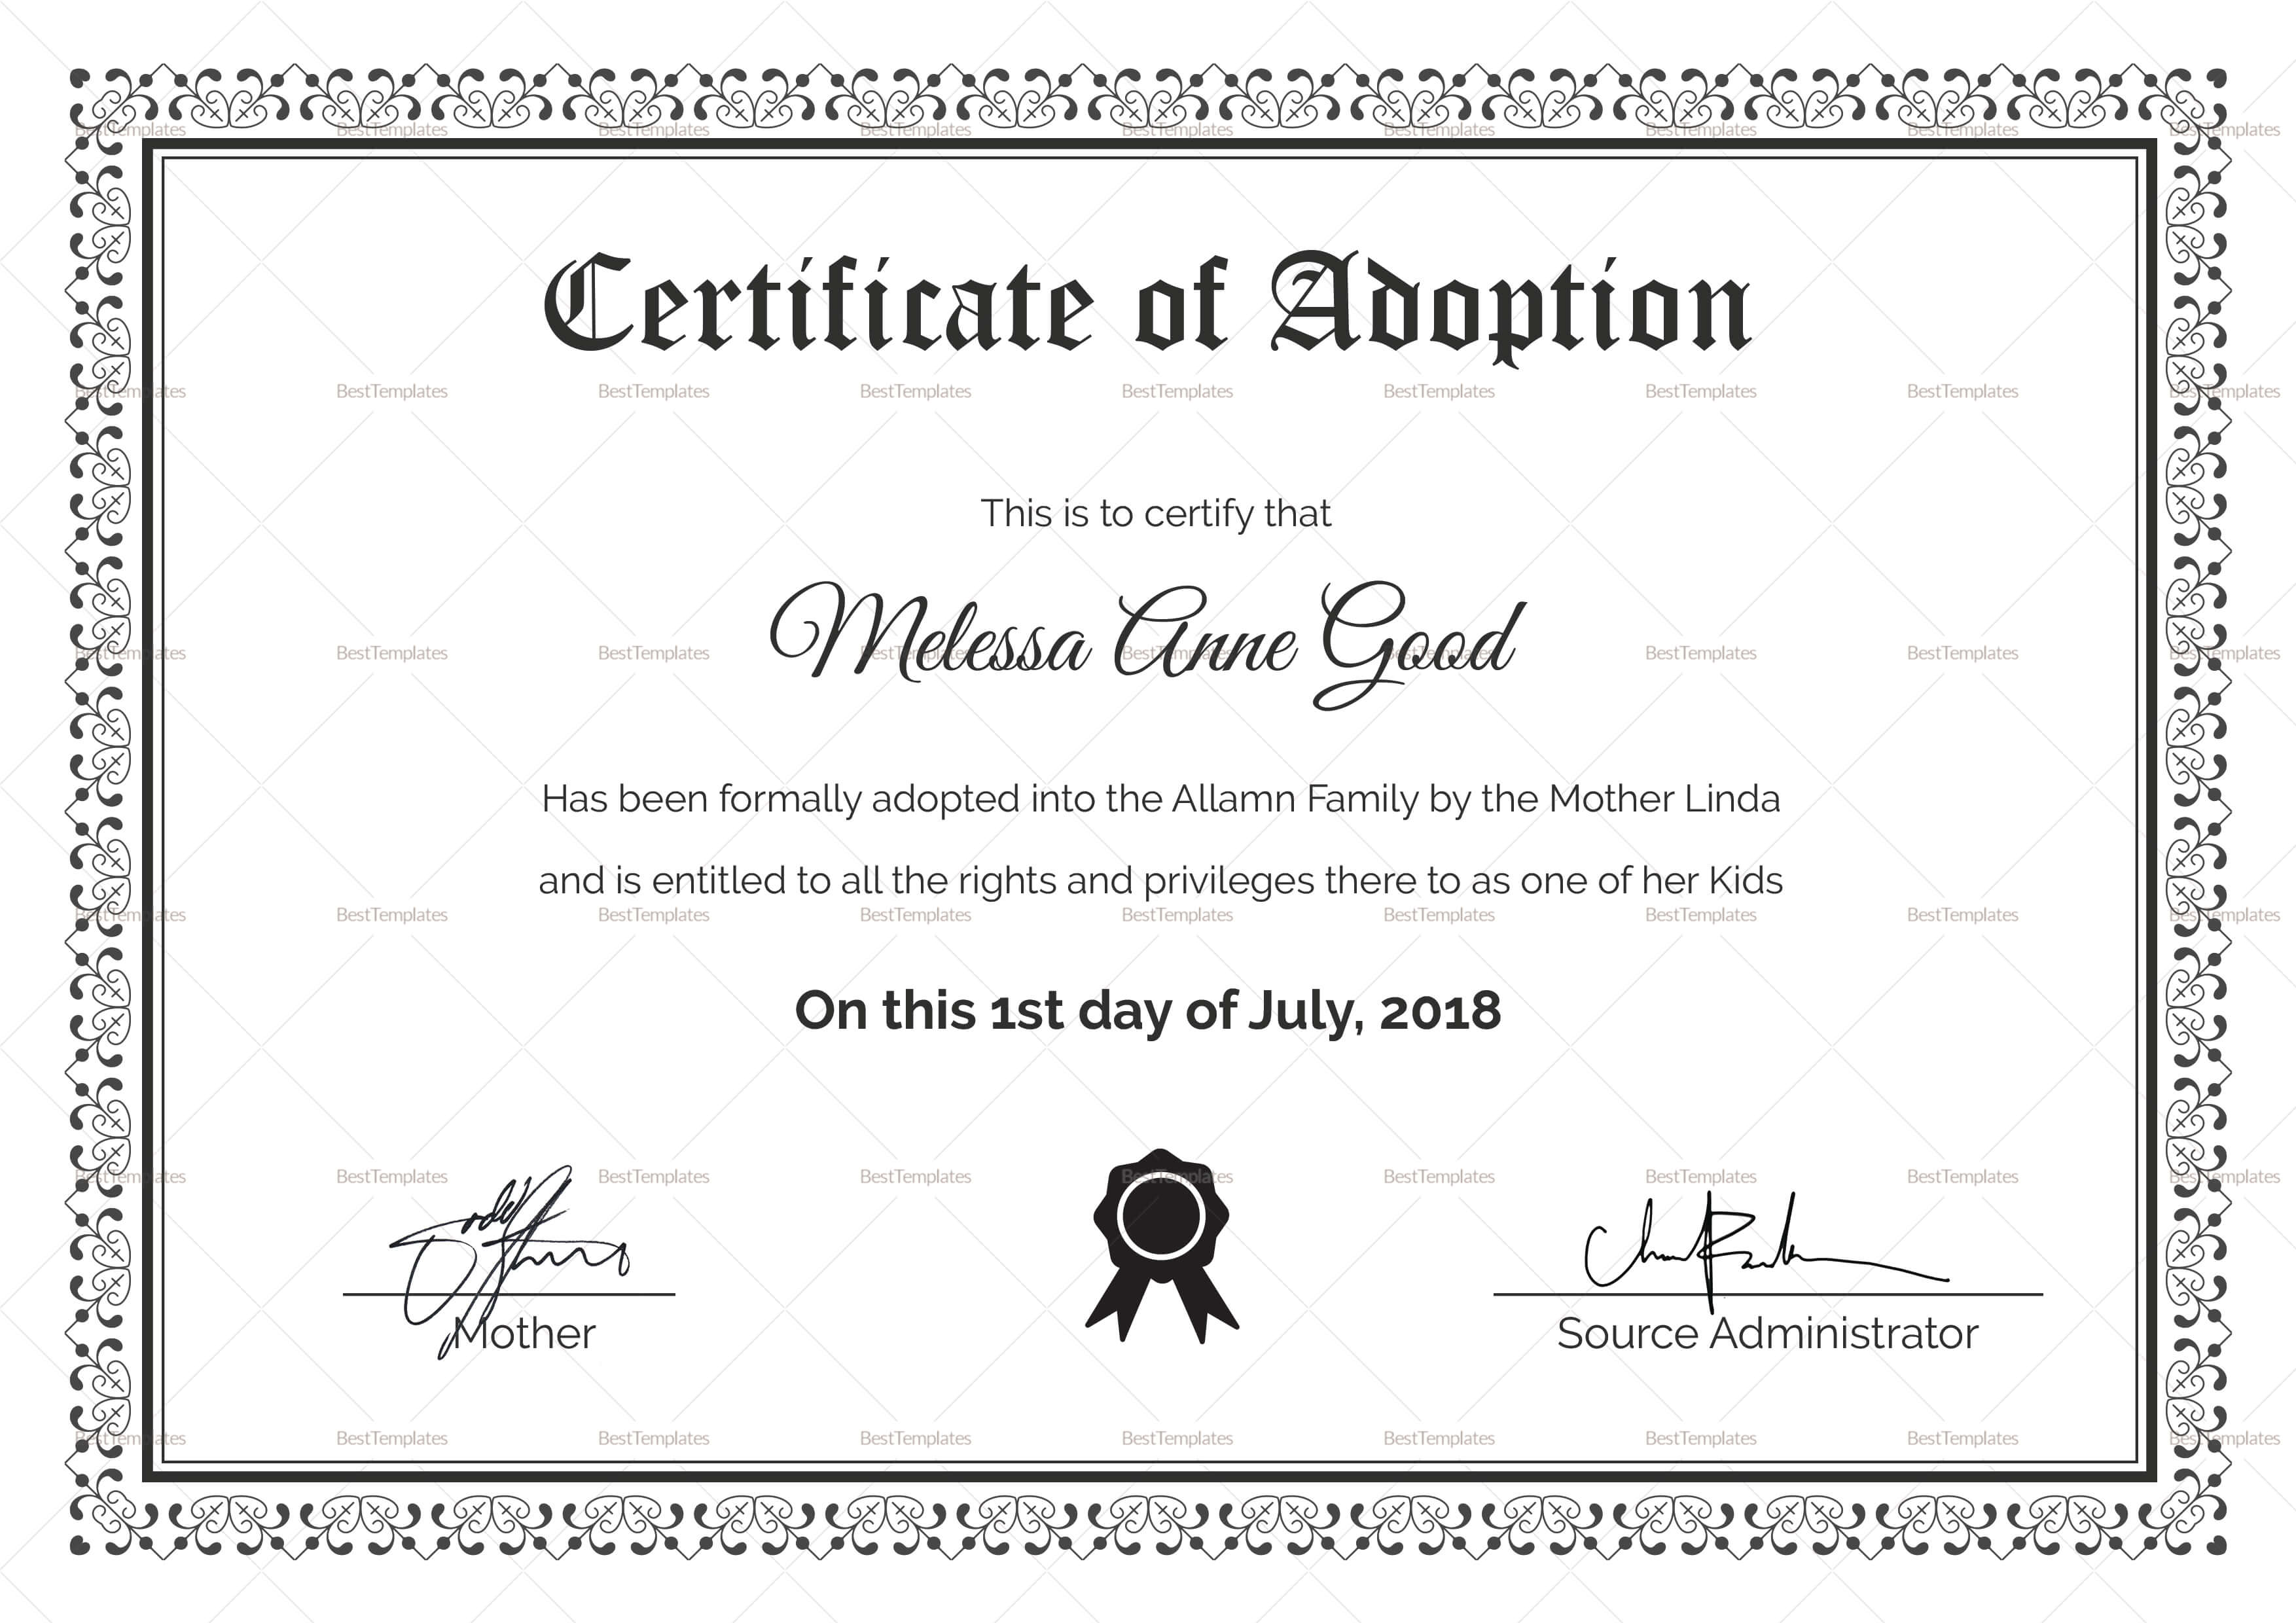 Adoption Certificate Design Template Regarding Blank Adoption Certificate Template